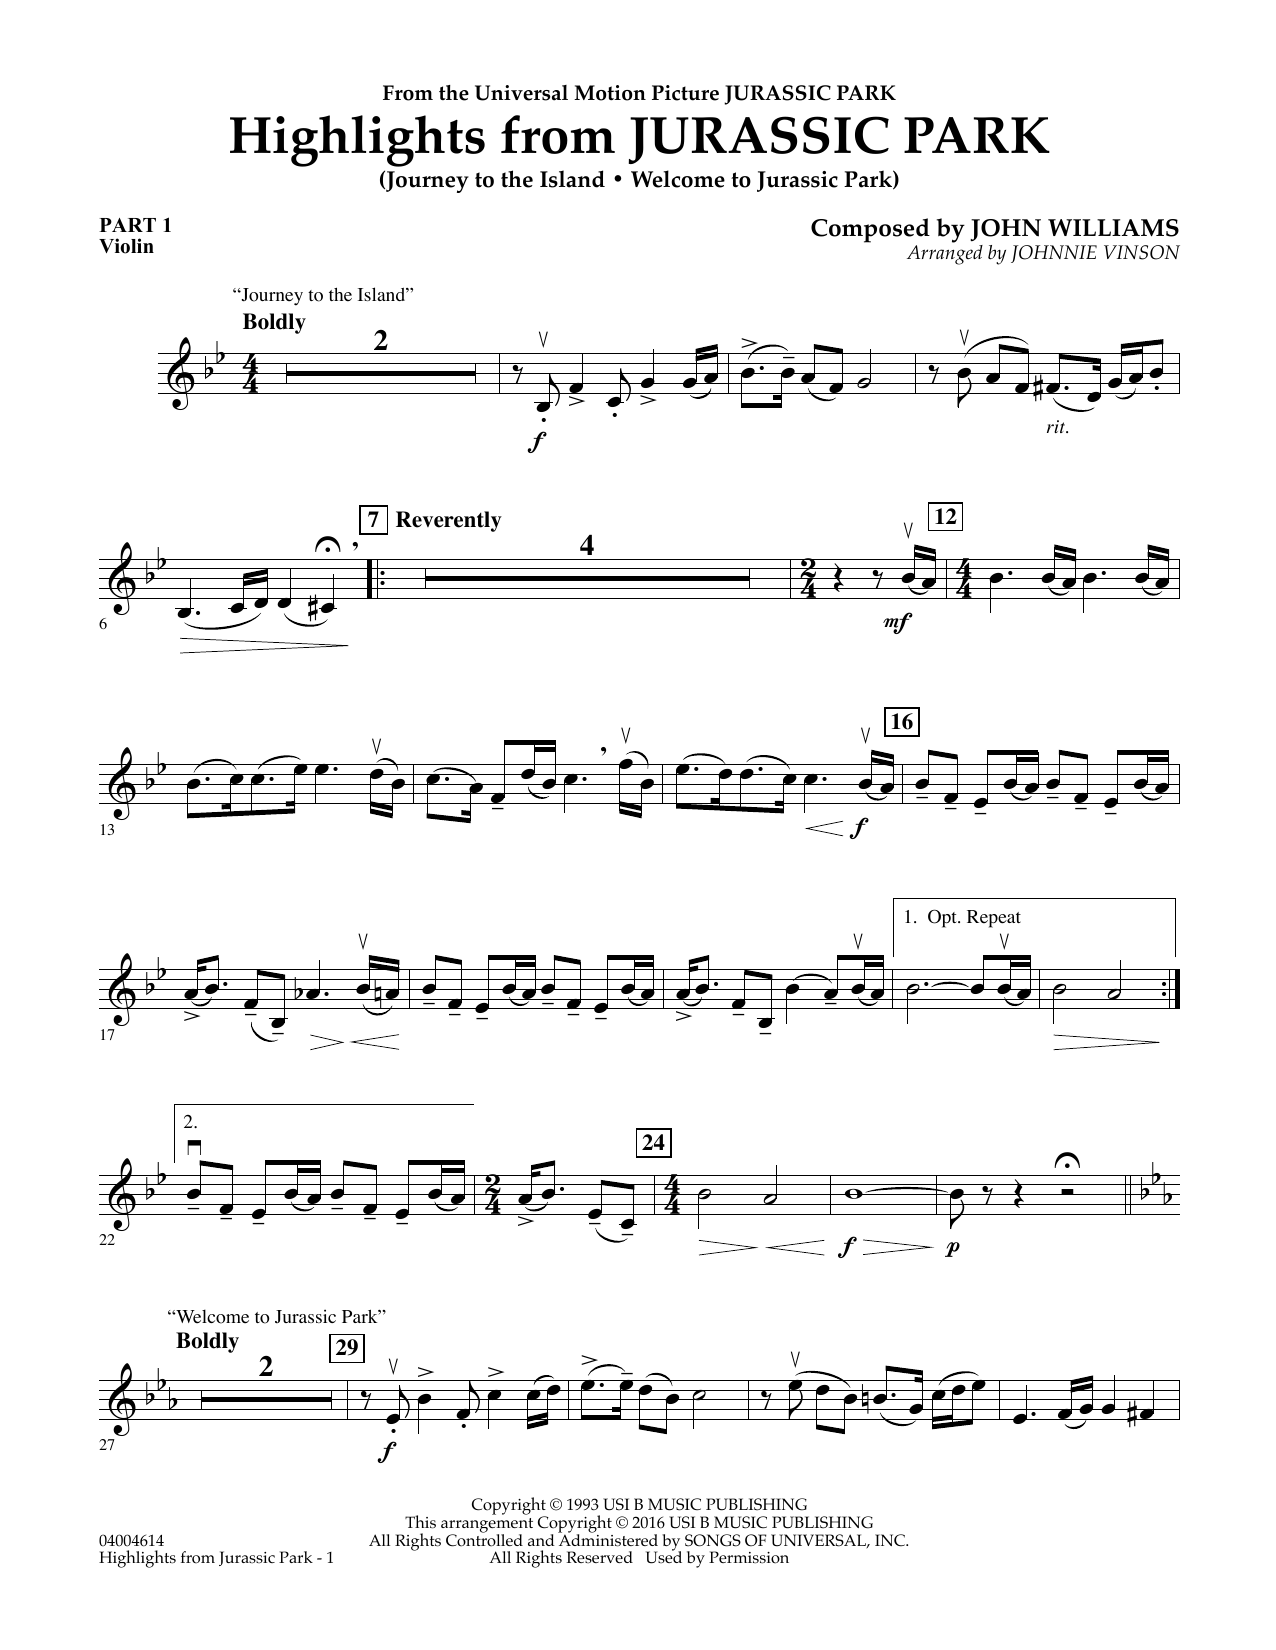 Highlights from Jurassic Park - Pt.1 - Violin (Concert Band: Flex-Band)